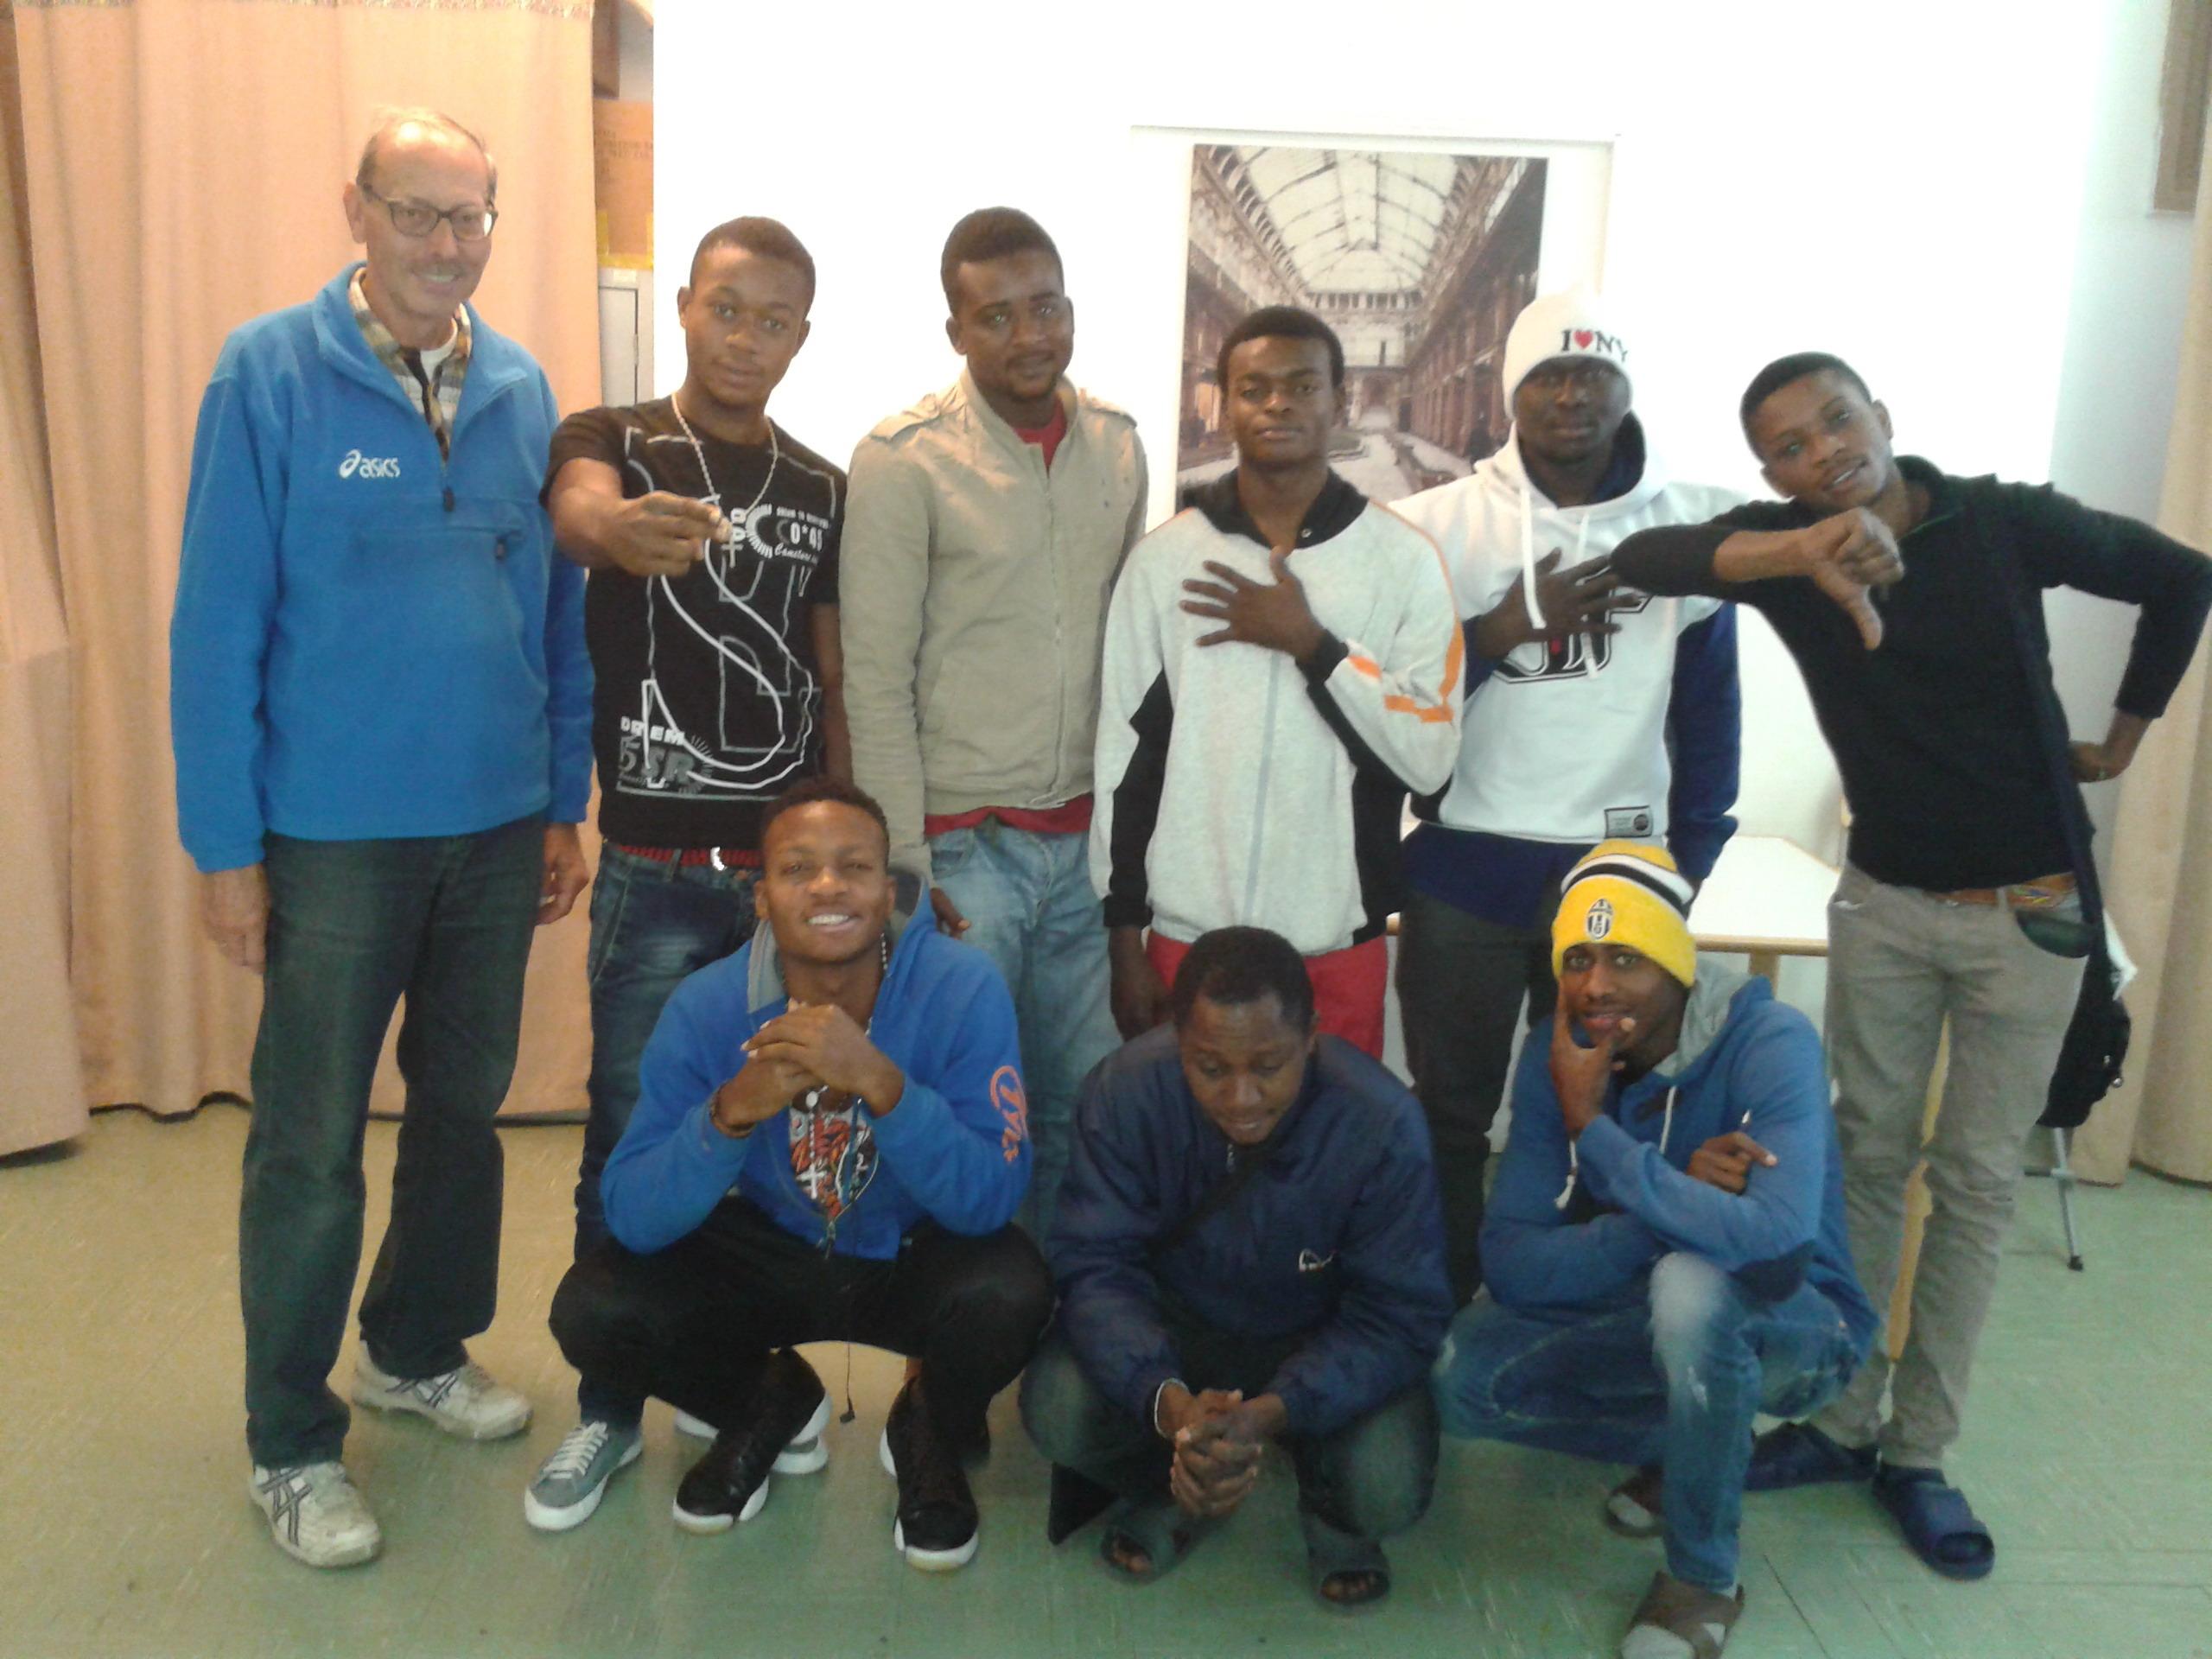 Arriveranno a Susa a fine ottobre i 18 rifugiati ospitati a Bardonecchia